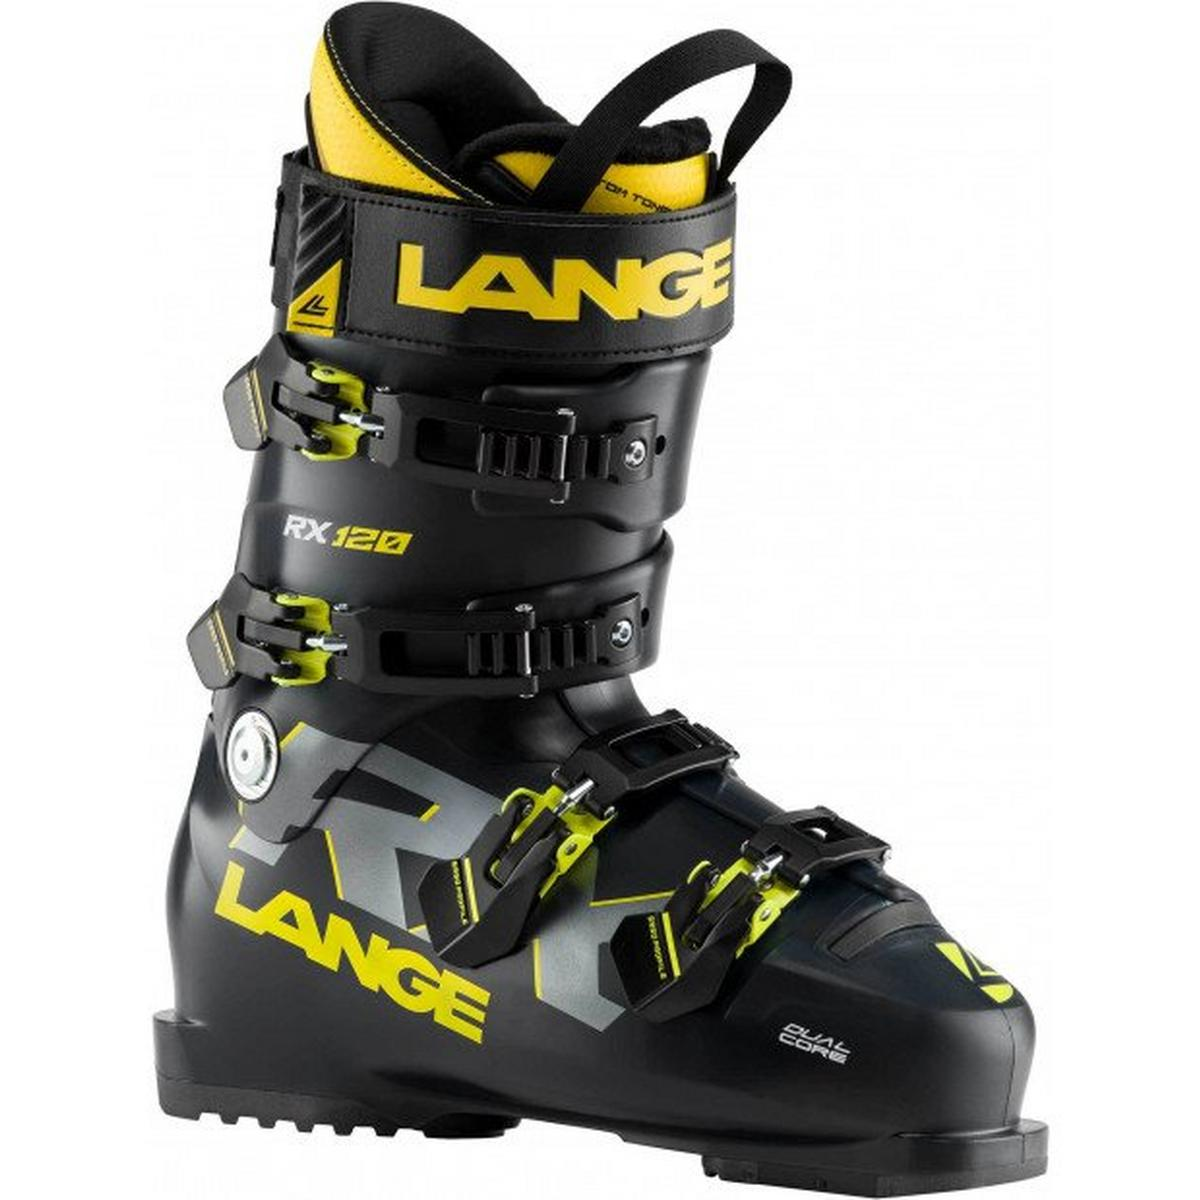 Lange Men's RX 120 Ski Boot - Black/Yellow